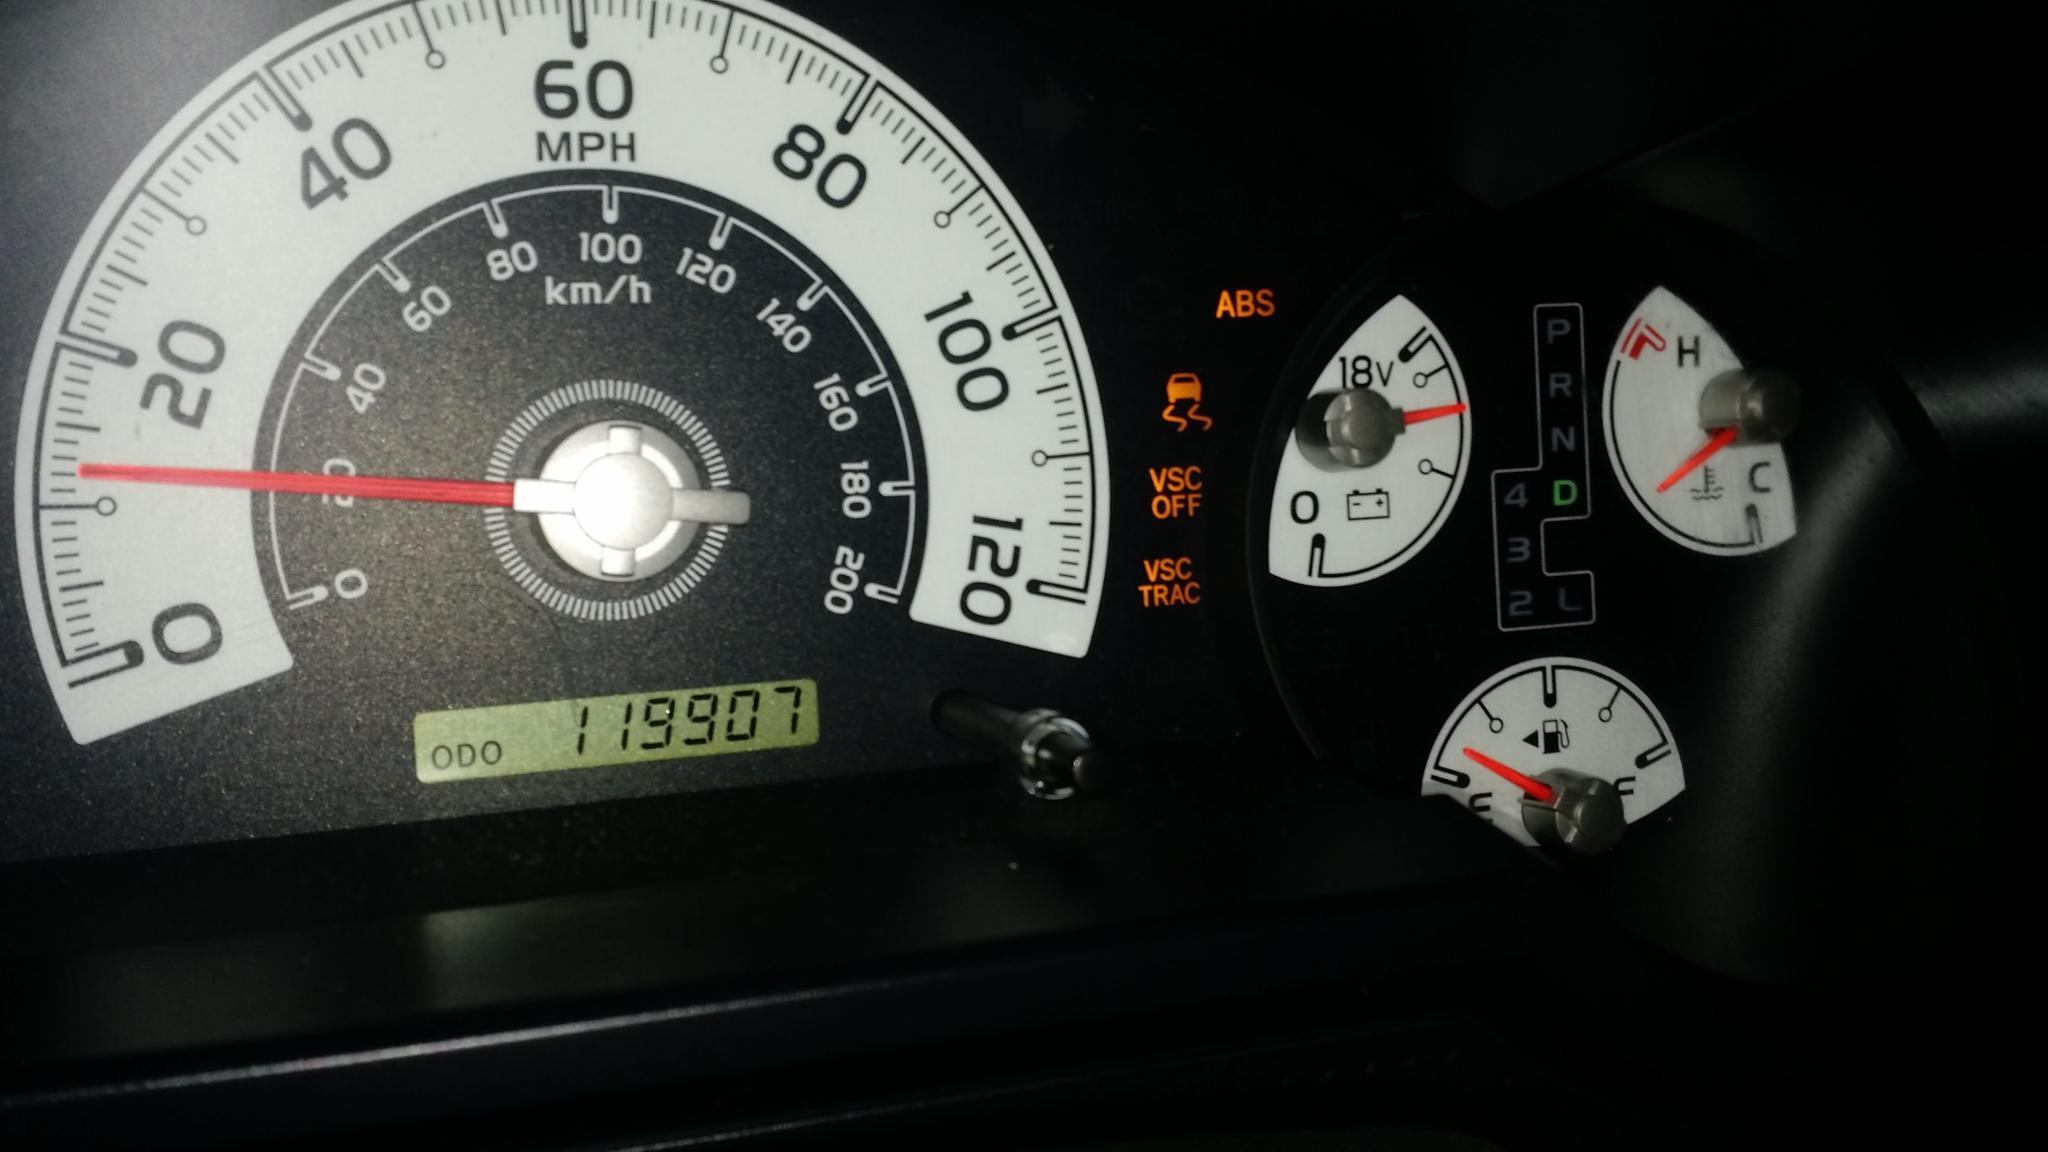 warning lights? ABS/VSC/TRAC - Toyota FJ Cruiser Forum